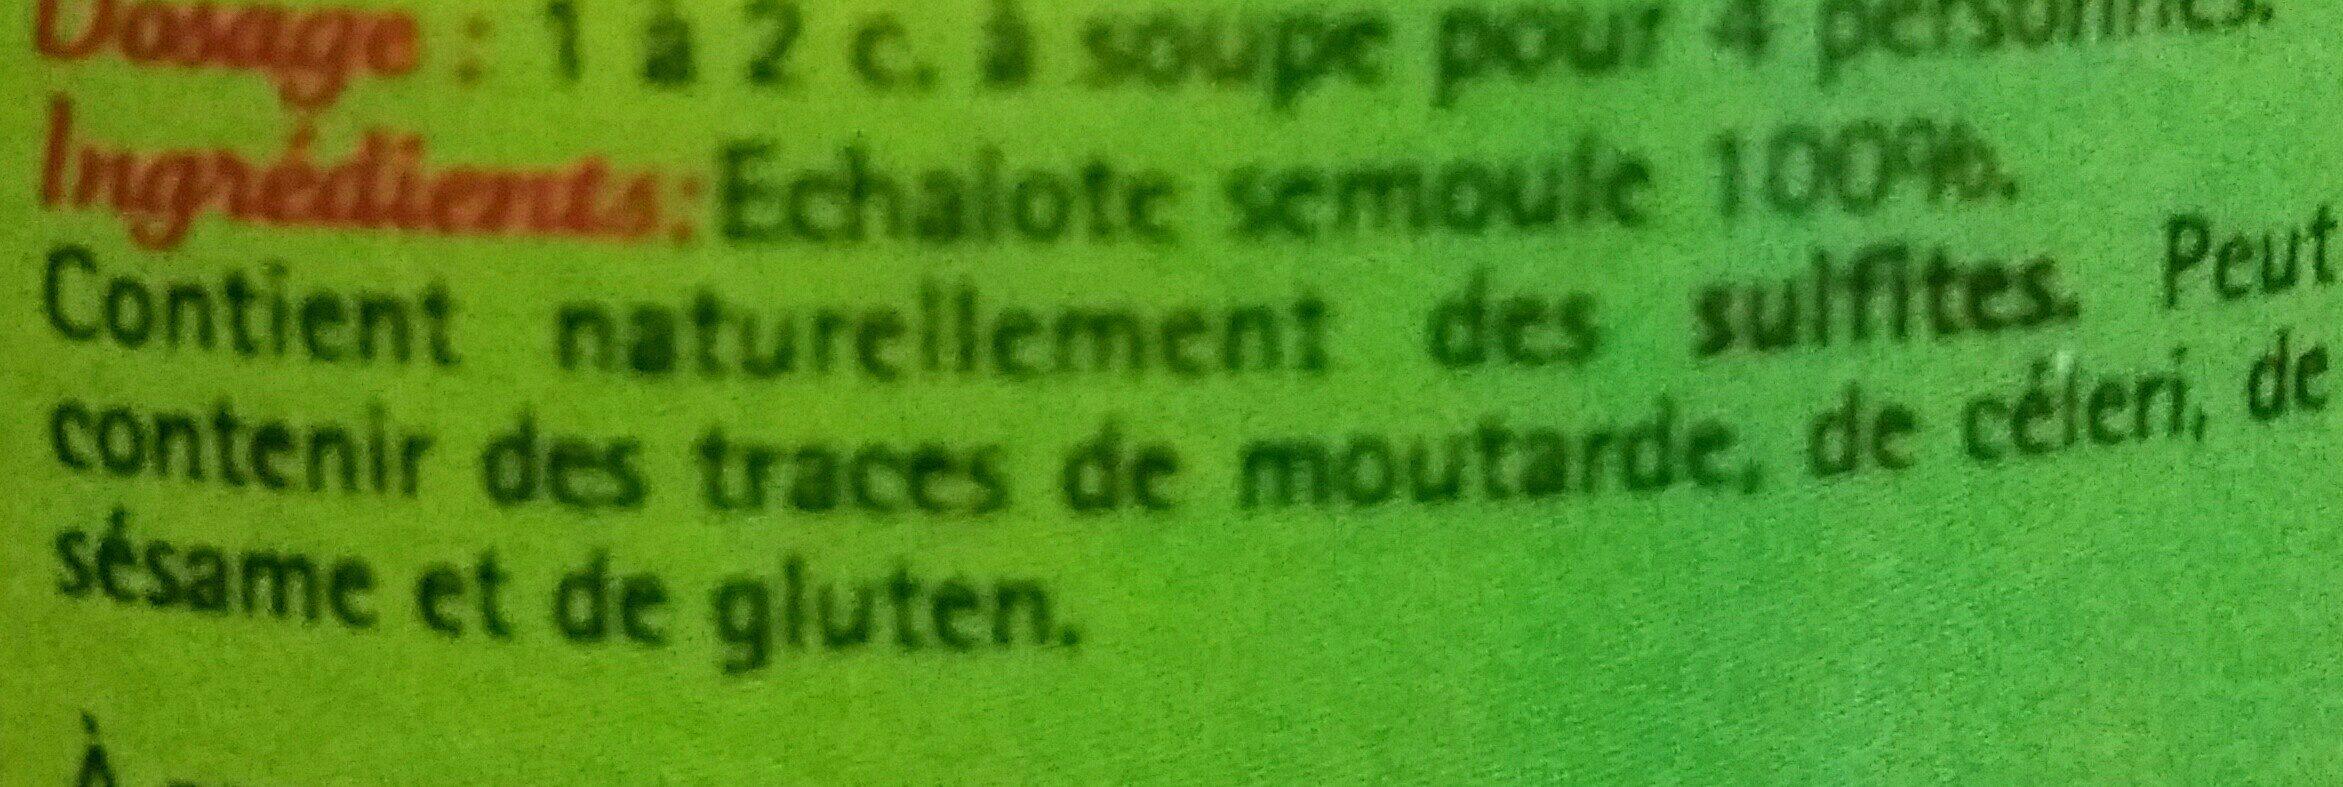 Echalote semoule - Ingrediënten - fr